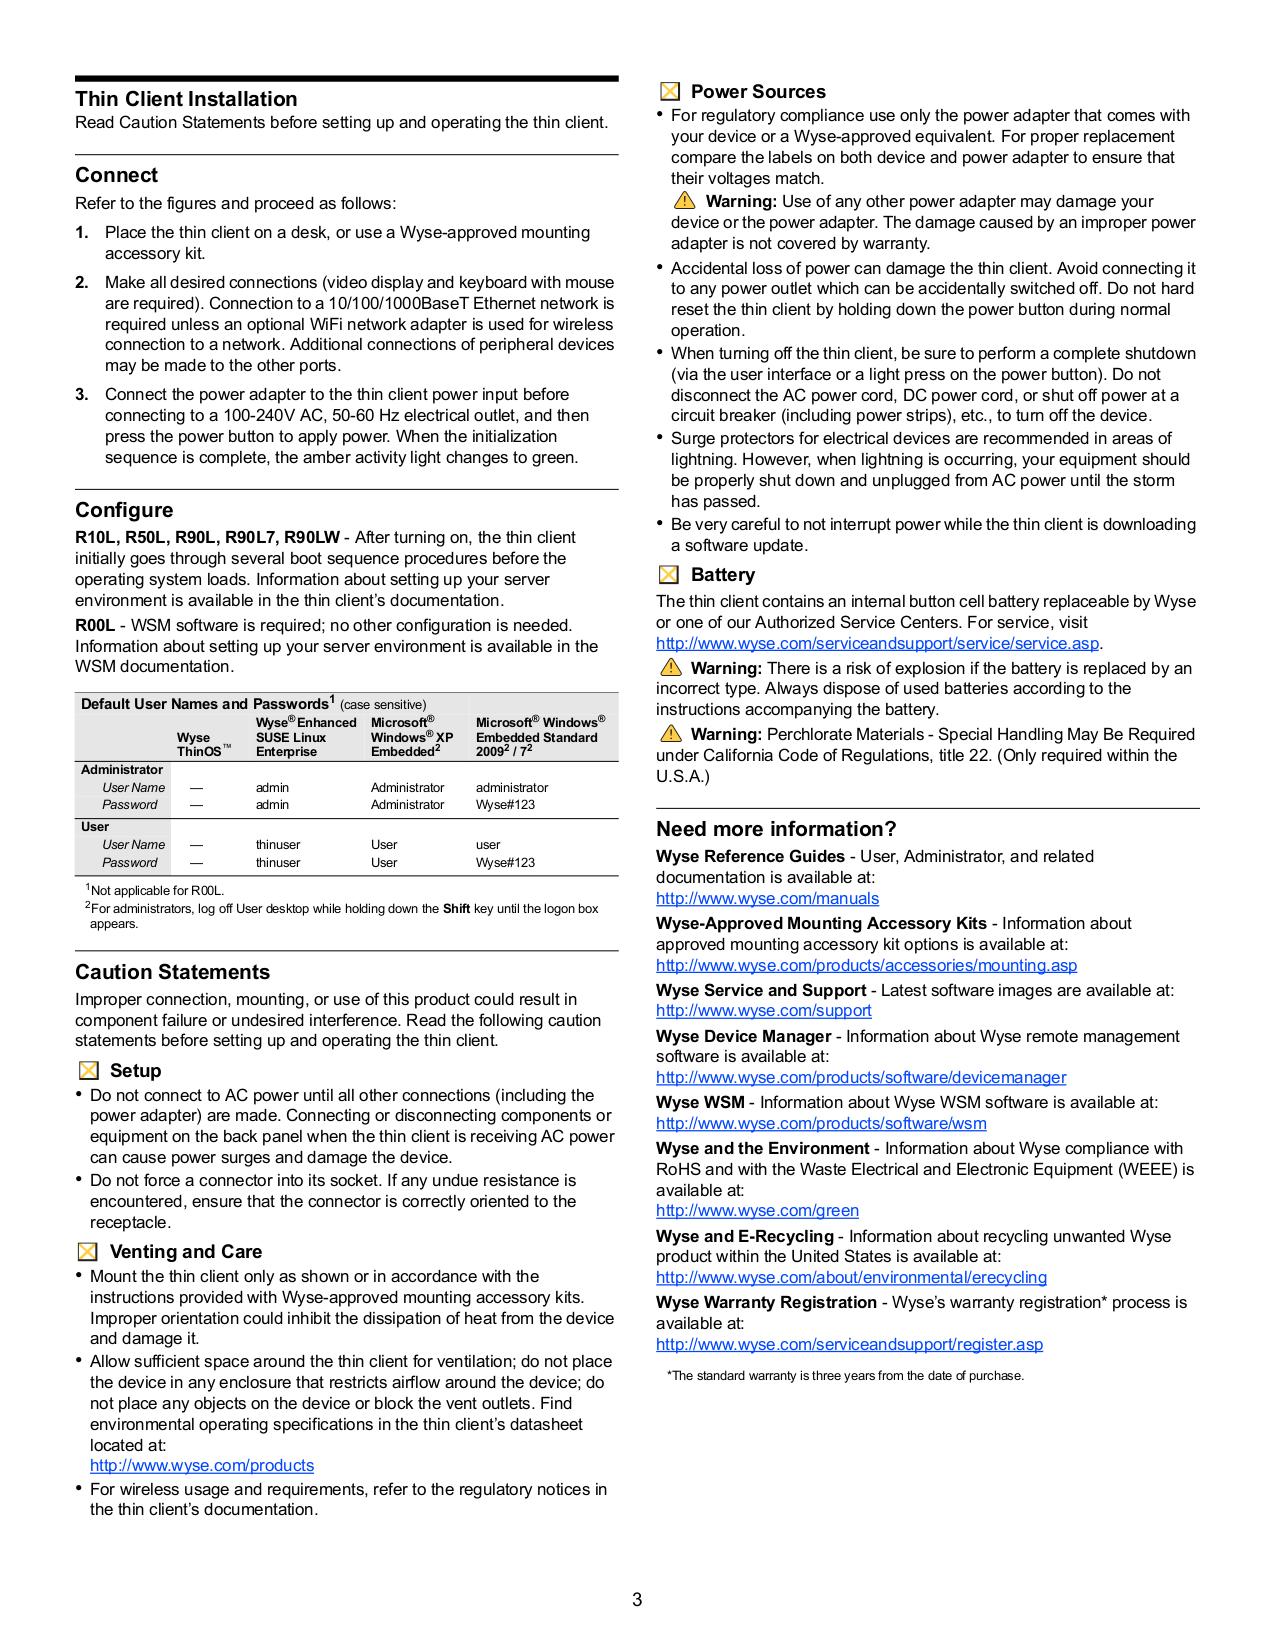 PDF manual for Wyse Desktop R90L